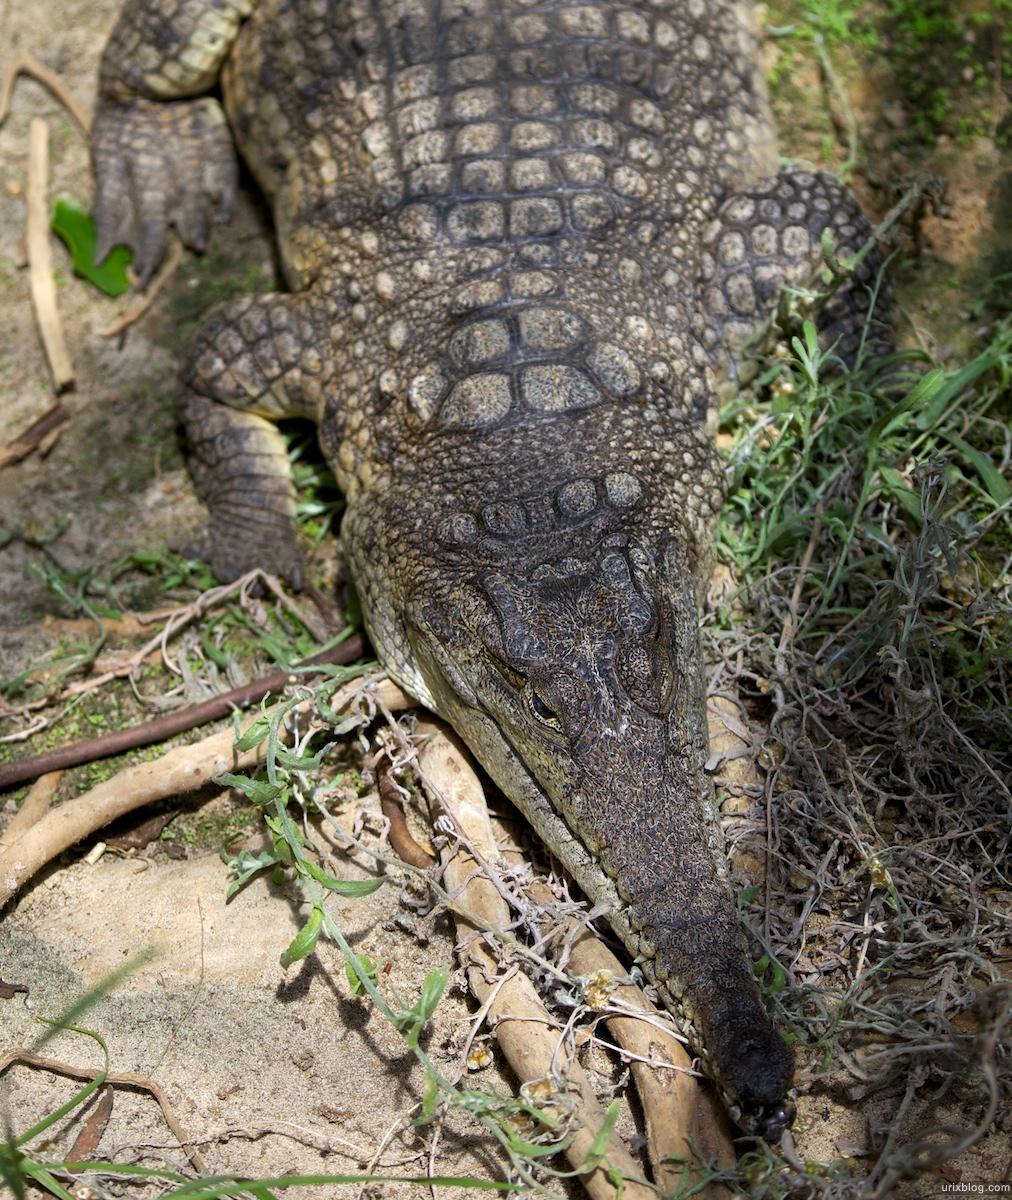 2011 South Australia, Kangaroo Island, Остров Кенгуру, Южная Австралия, Parndana Wildlife Park, crocodile, крокодил